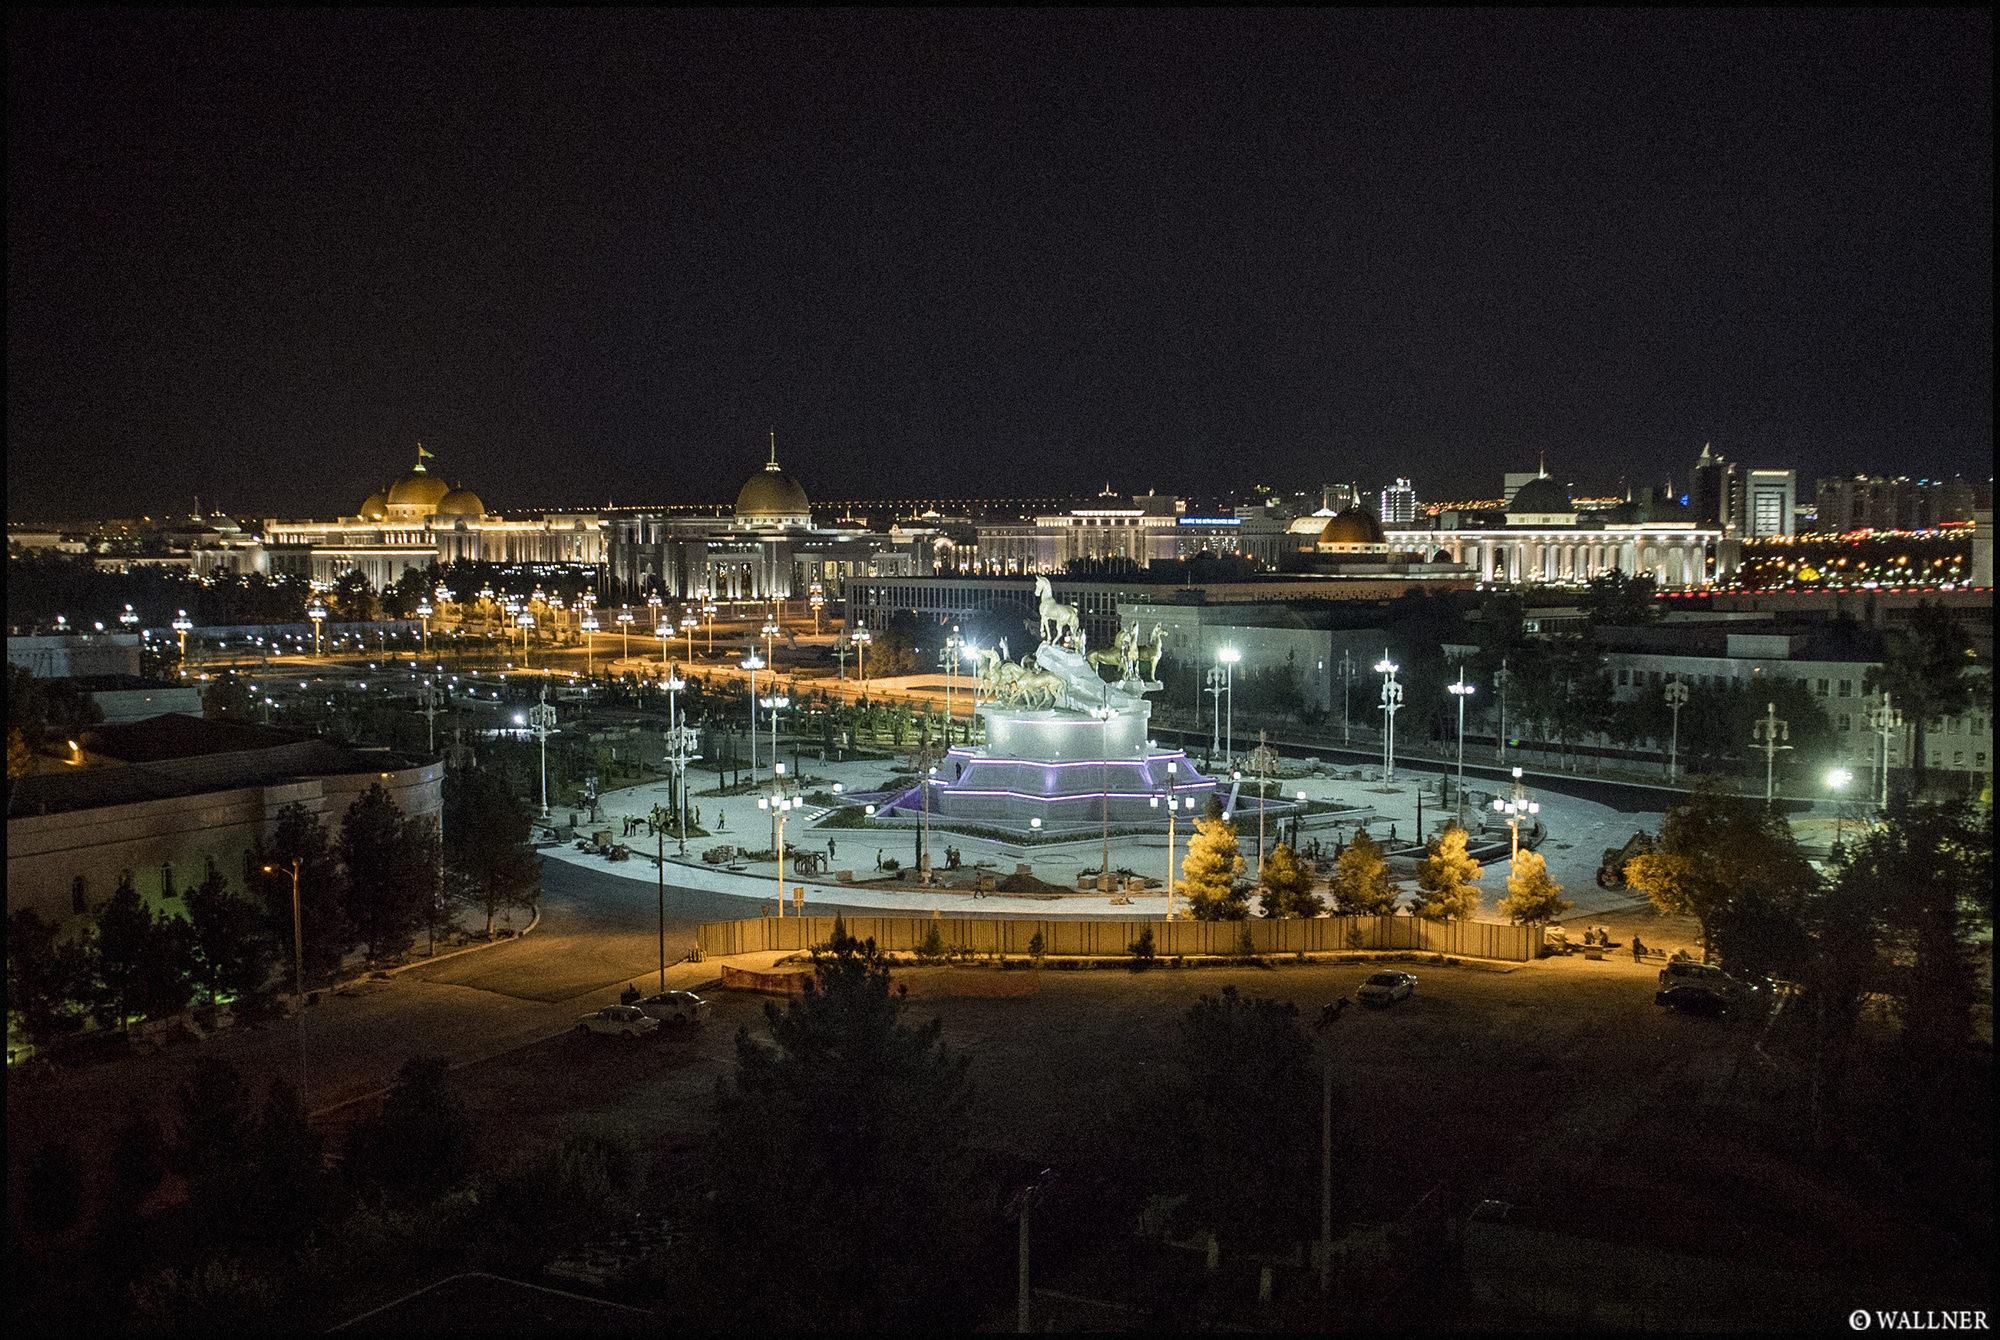 Digital Patrik Wallner Ashgabat Under Construction at Night LOWQ 2000P